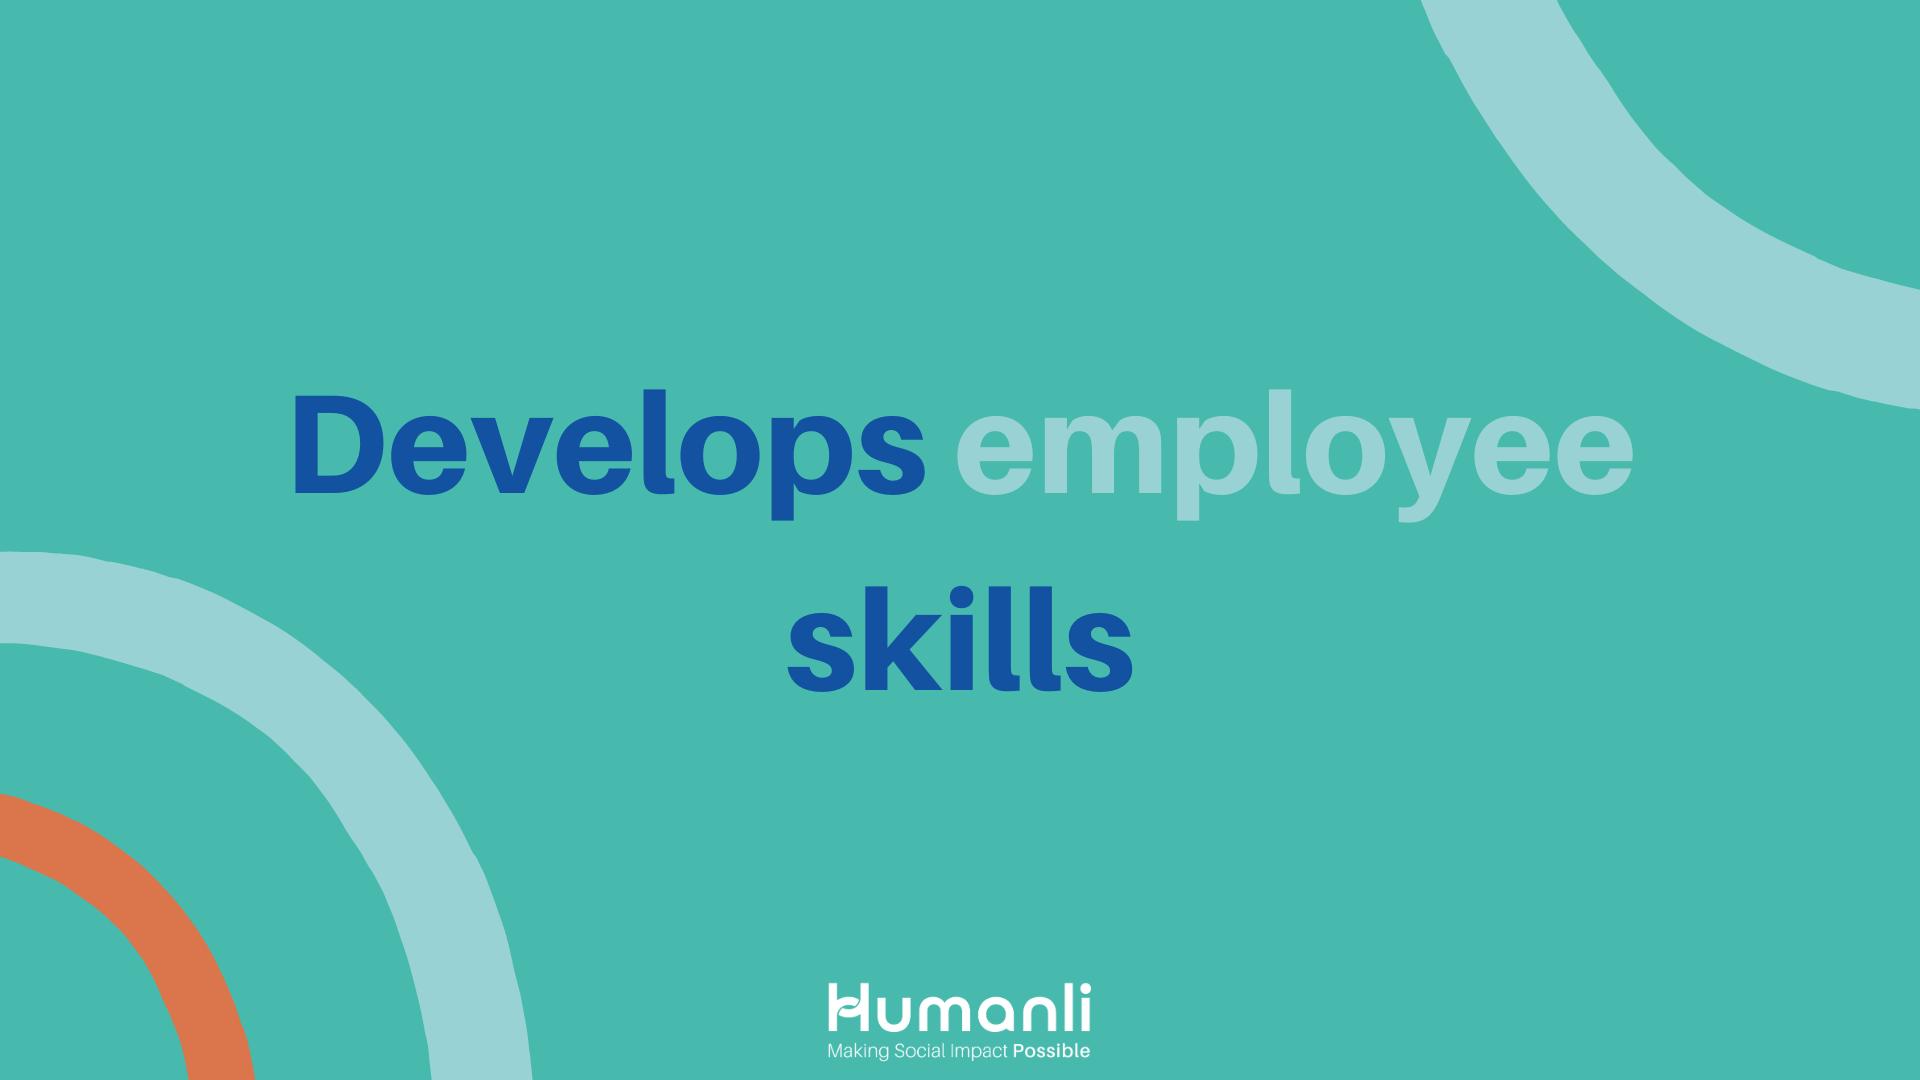 Develops employee skills